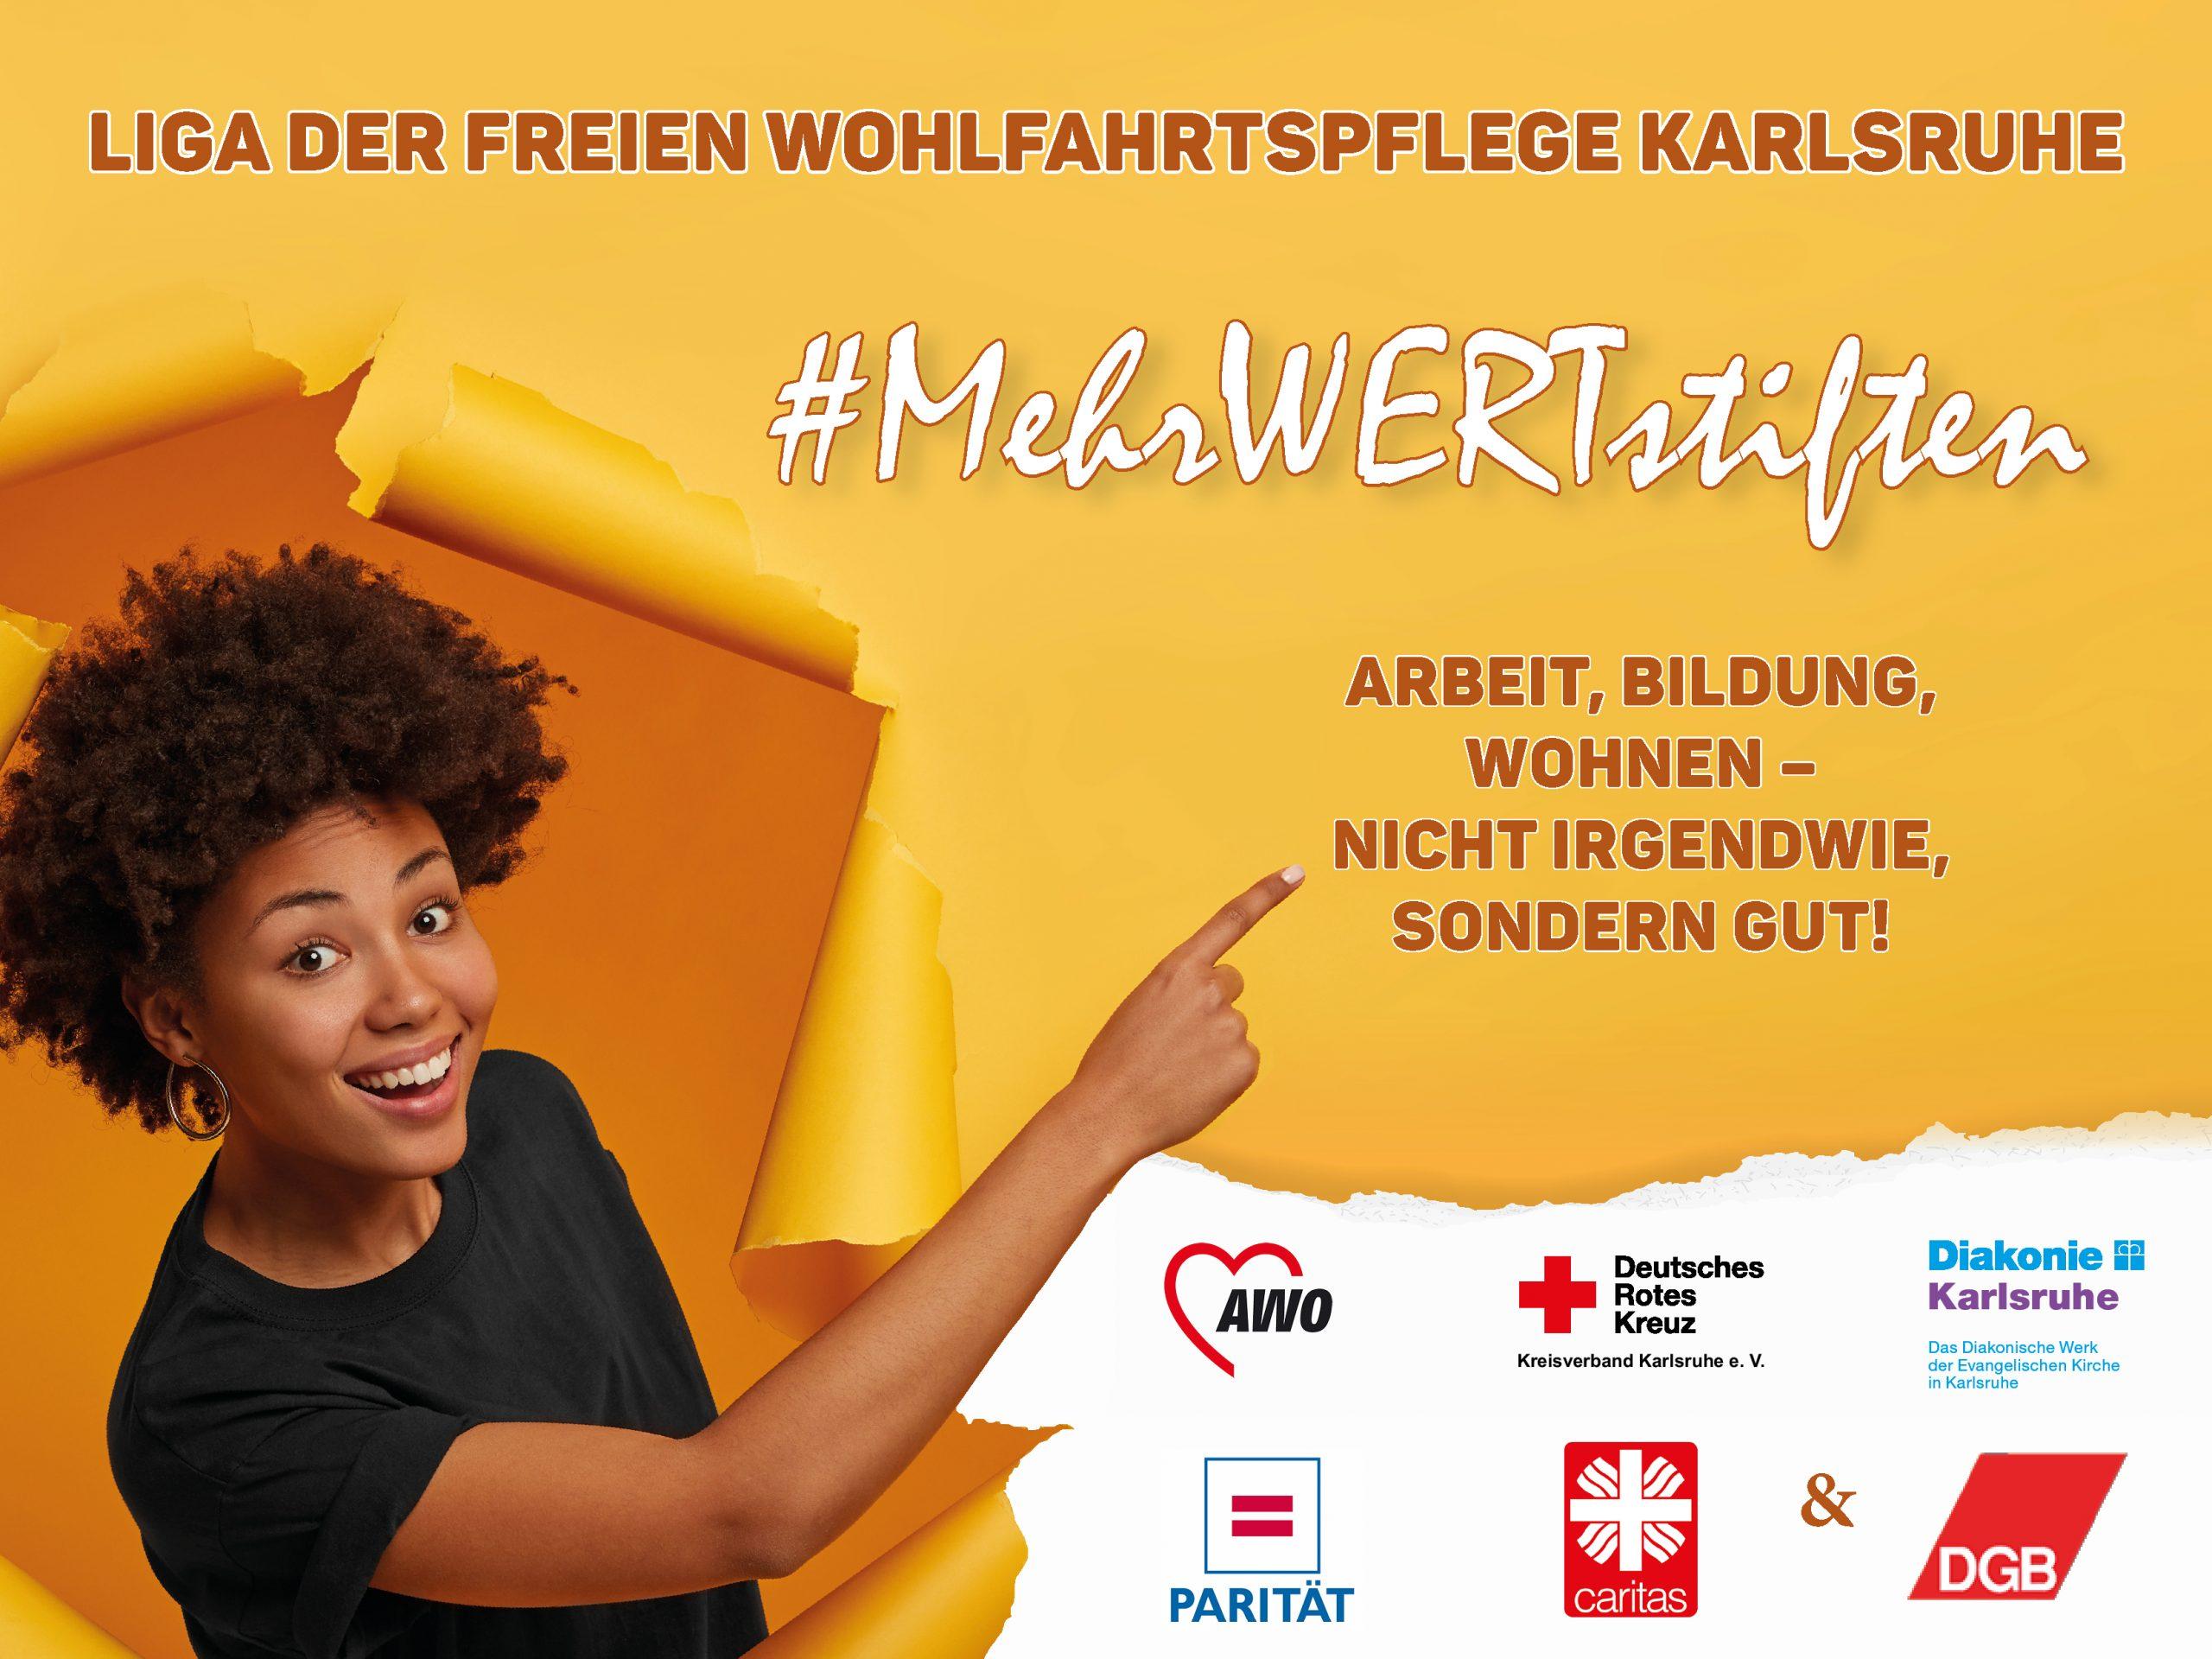 6 Kachel AWO WebsiteBanner scaled AWO Karlsruhe